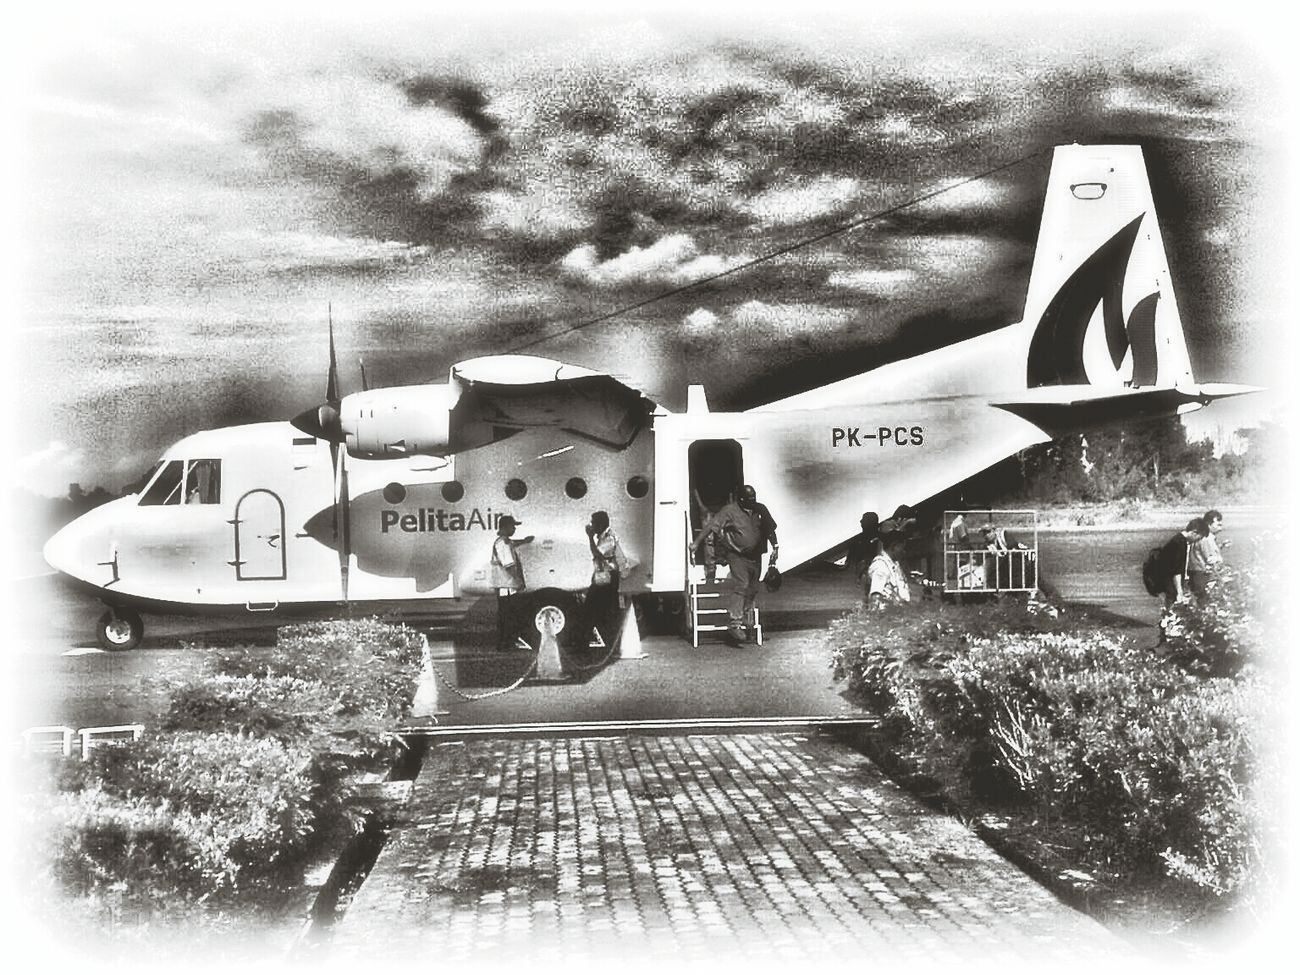 "Pesawat Perintis, menjangkau dan menjelajah tiap jengkal wilayah Nusantara, hubungkan satu titik ke titik lain, terbang rendah menyapa bumi, antar pribadi"" penuh dedikasi menuju off shore. #ekabees #hdr_pics #hdr_arts #hdr_brazil #hdr_norge #hdr_Brunei #hdr_lebanon #hdr_indonesia #hdr_uae #Hdr_SHOTS #ig_planet_street #IGS_PHOTOS #ig_exquisite #ig_indonesia_ #ig_Malaysia #insta_kaskus #instanusantaraPalingIndonesia #instanusantara #instagram #adoramaphoto #plazaindonesia_kemerdekaan #gf_indonesia #macstuff #SRUDUKFOLLOW #SRUDUKFOTO #SFfoto #IGS_PHOTOS #stunning_shot #WorldinGram wu_asia Ekabees #hdr_pics #hdr_arts #hdr_brazil #hdr_norge #hdr_Brunei #hdr_lebanon #hdr_indonesia #hdr_uae #Hdr_SHOTS #ig_planet_street #IGS_PHOTOS #ig_exquisite #ig_indonesia_ #ig_Malaysia #insta_kaskus #instanusantaraPalingIndonesia #instanusantara #instagram"